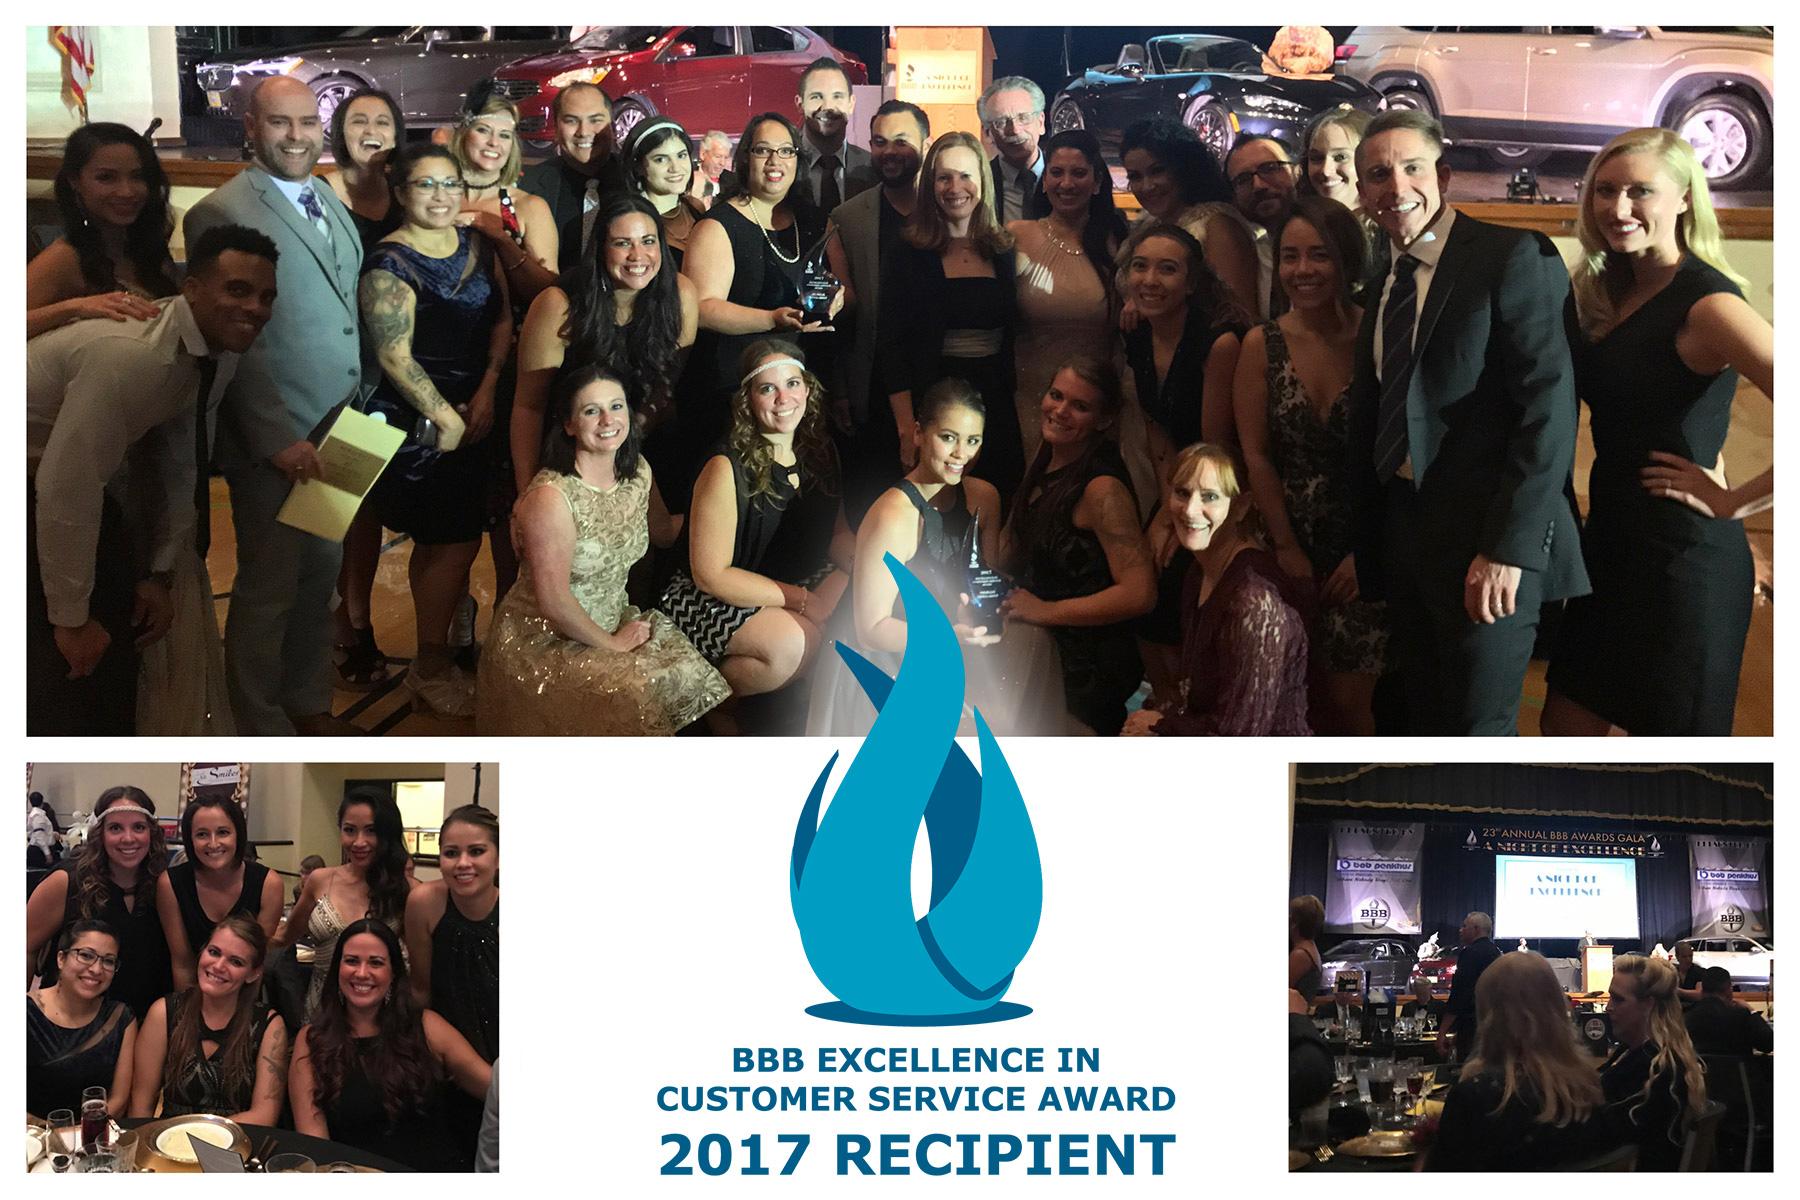 BBB 2017 Ceremony Customer Service Award